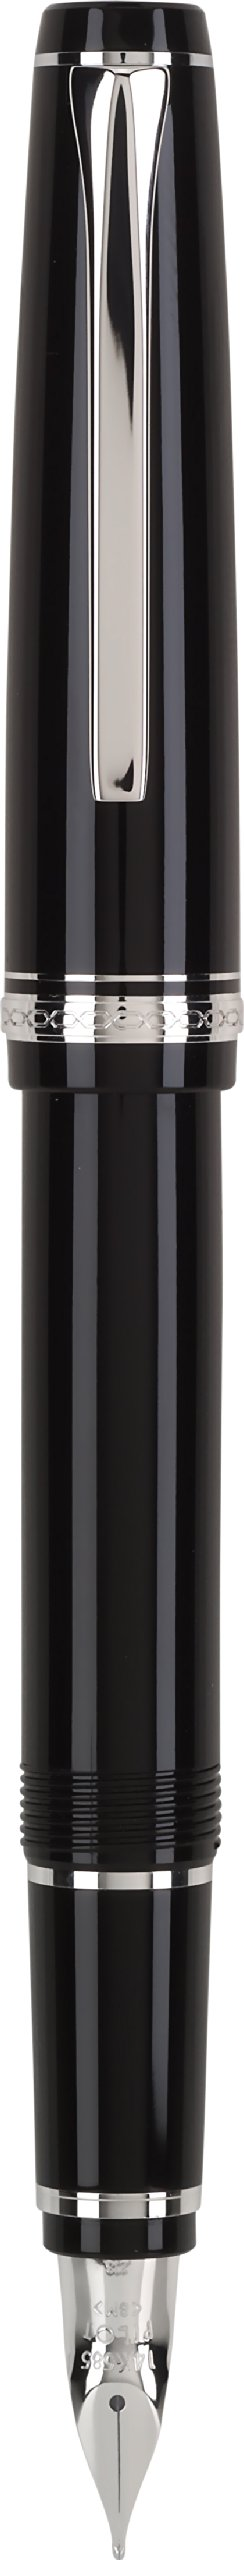 Pilot Namiki Falcon Collection Fountain Pen, Black with Rhodium Accents, Soft Medium Nib (60742)